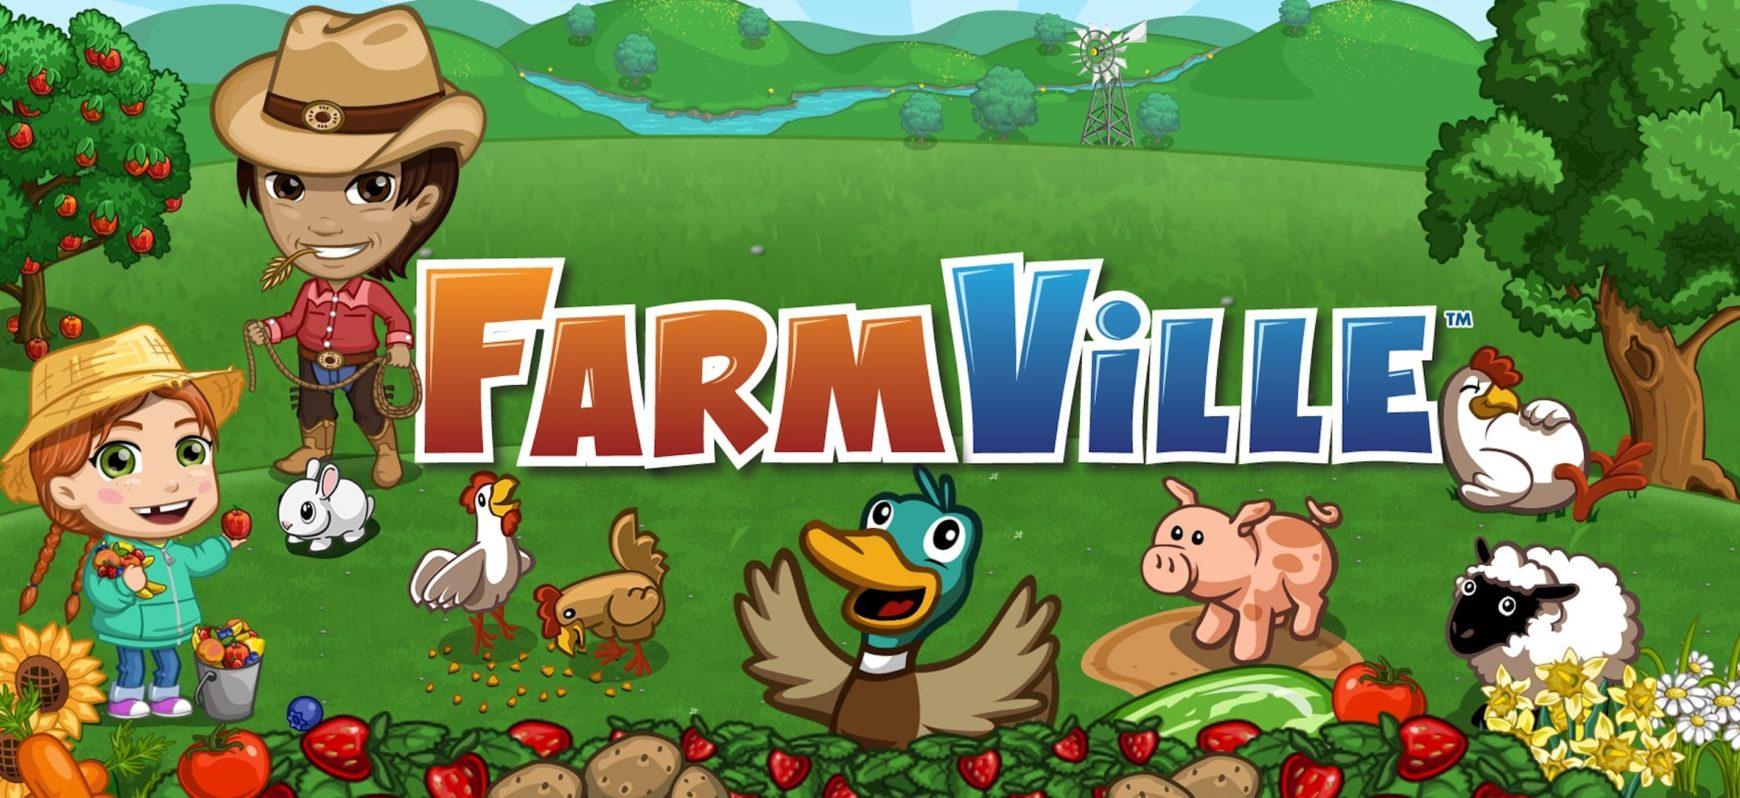 farmville zynga facebook koniec 1740x798 1